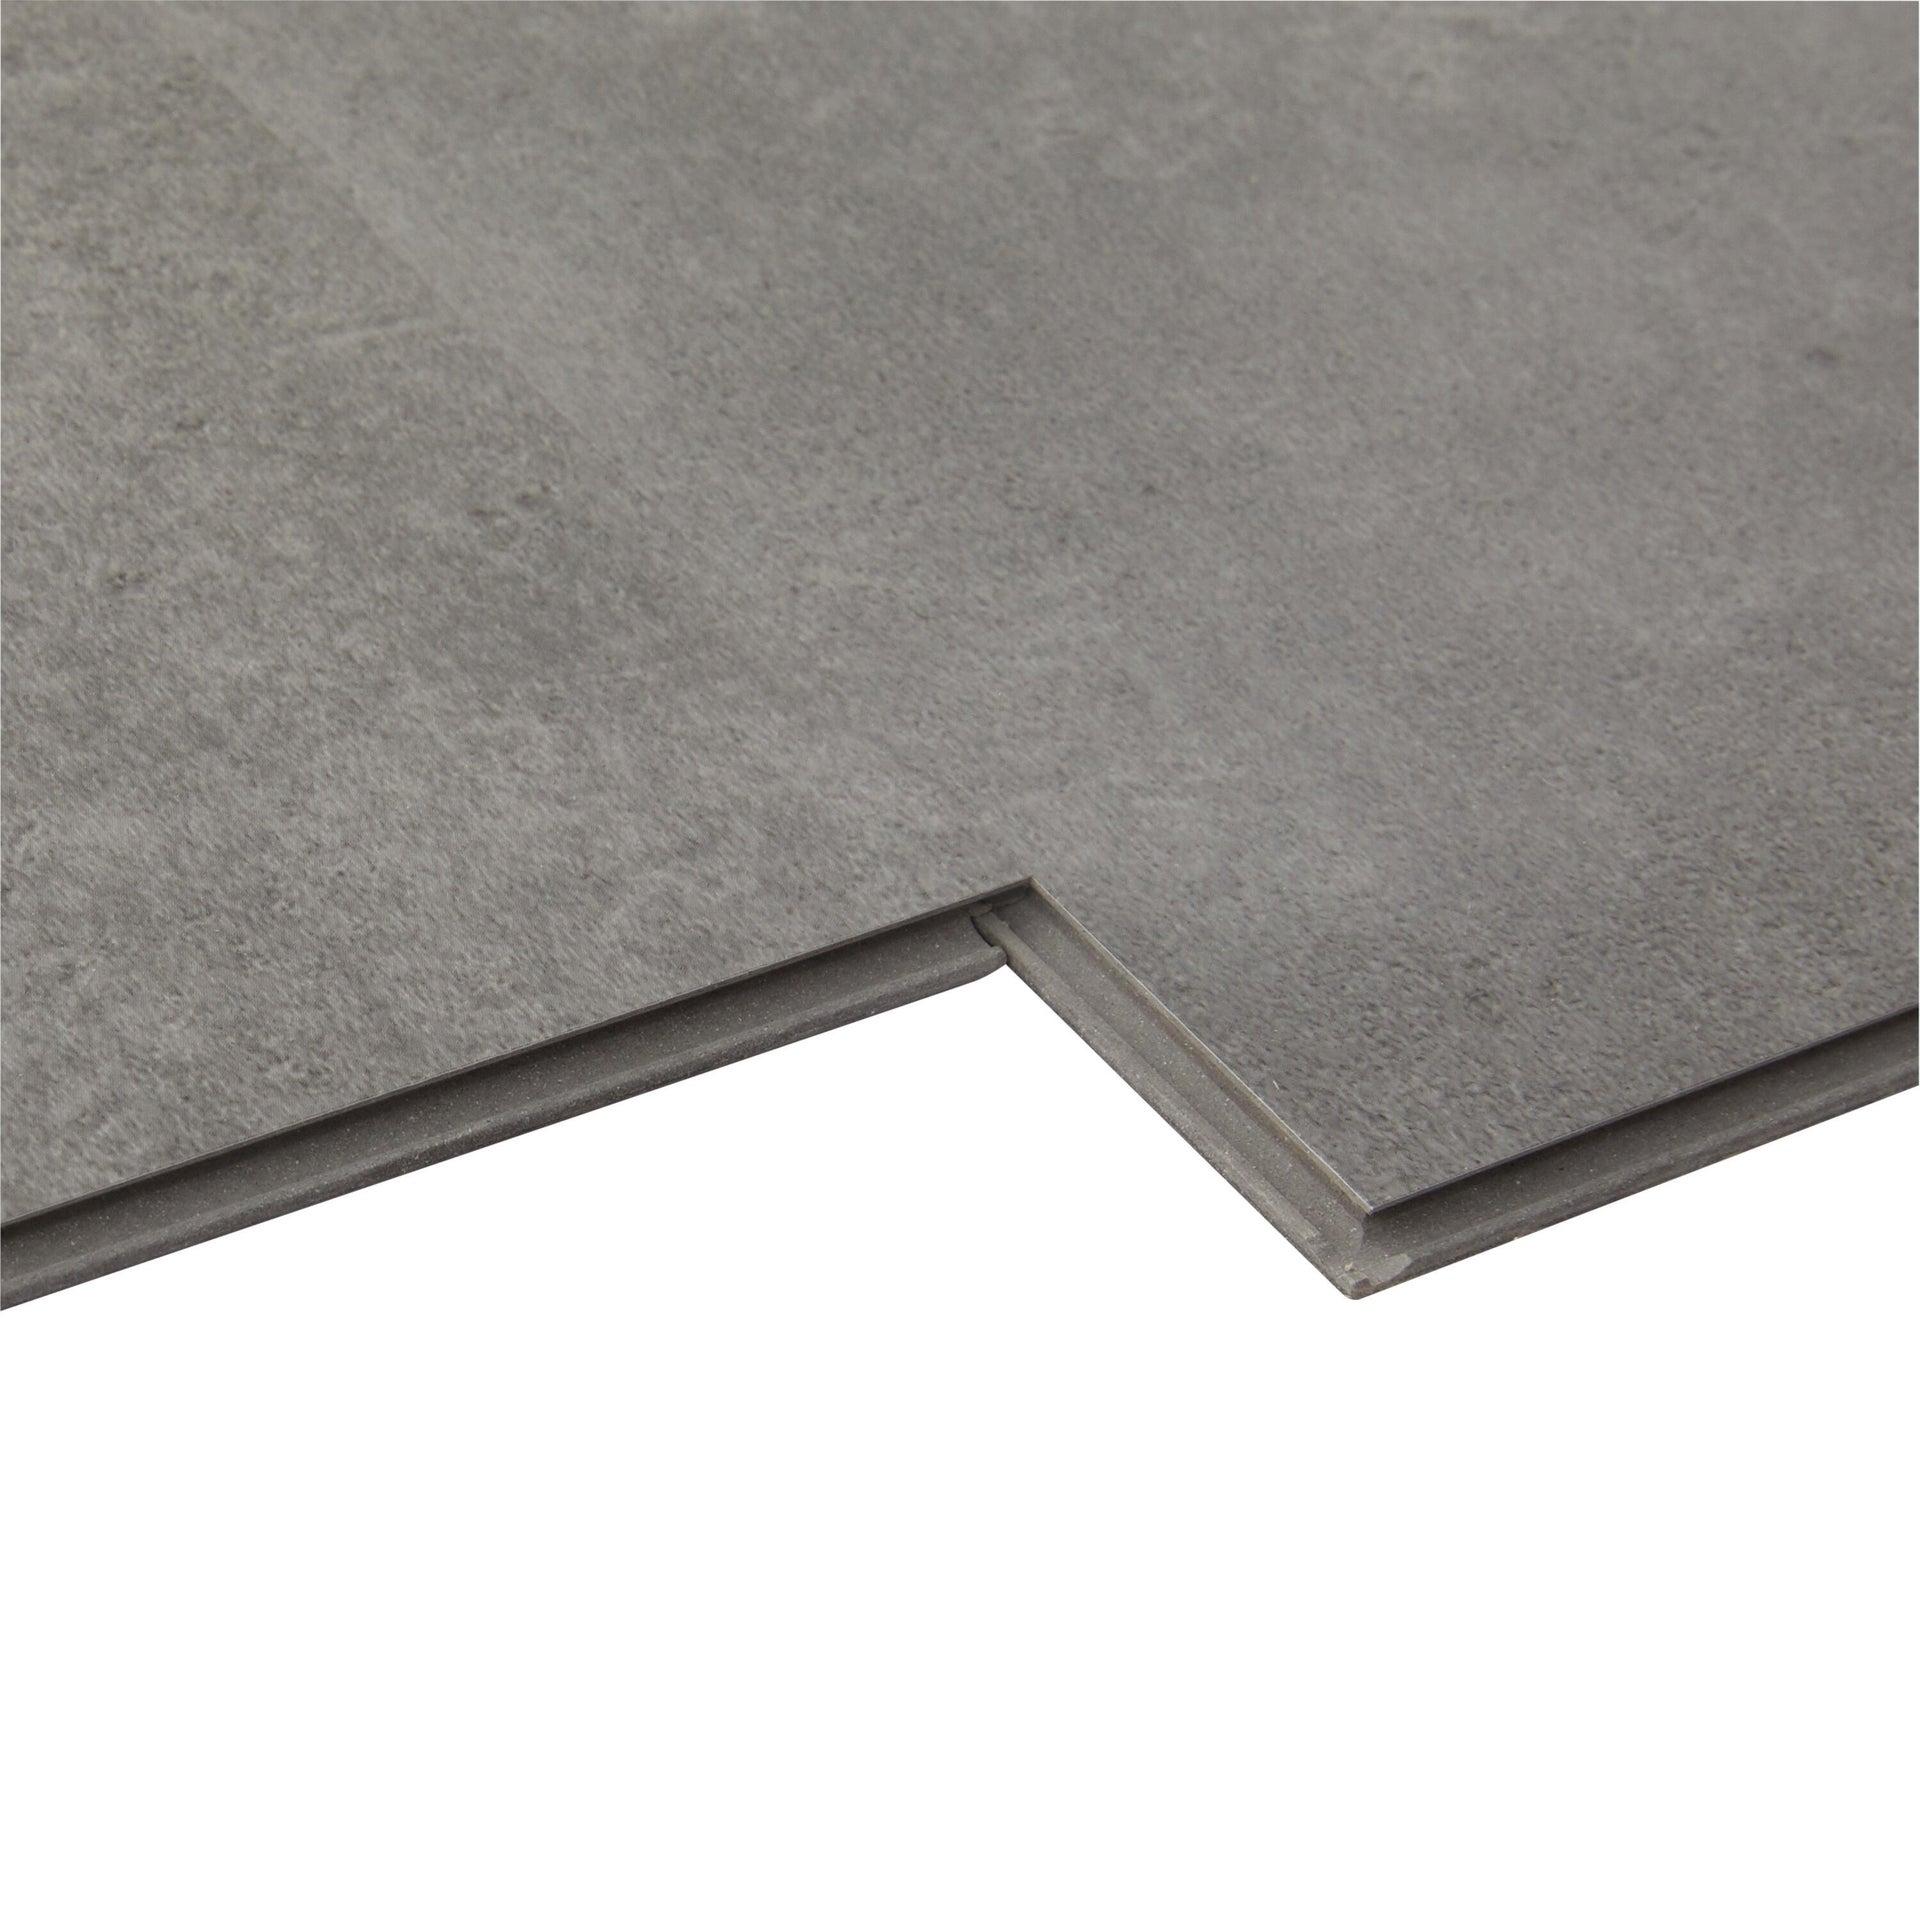 Pavimento PVC incastro Tolu Sp 4 mm grigio / argento - 13